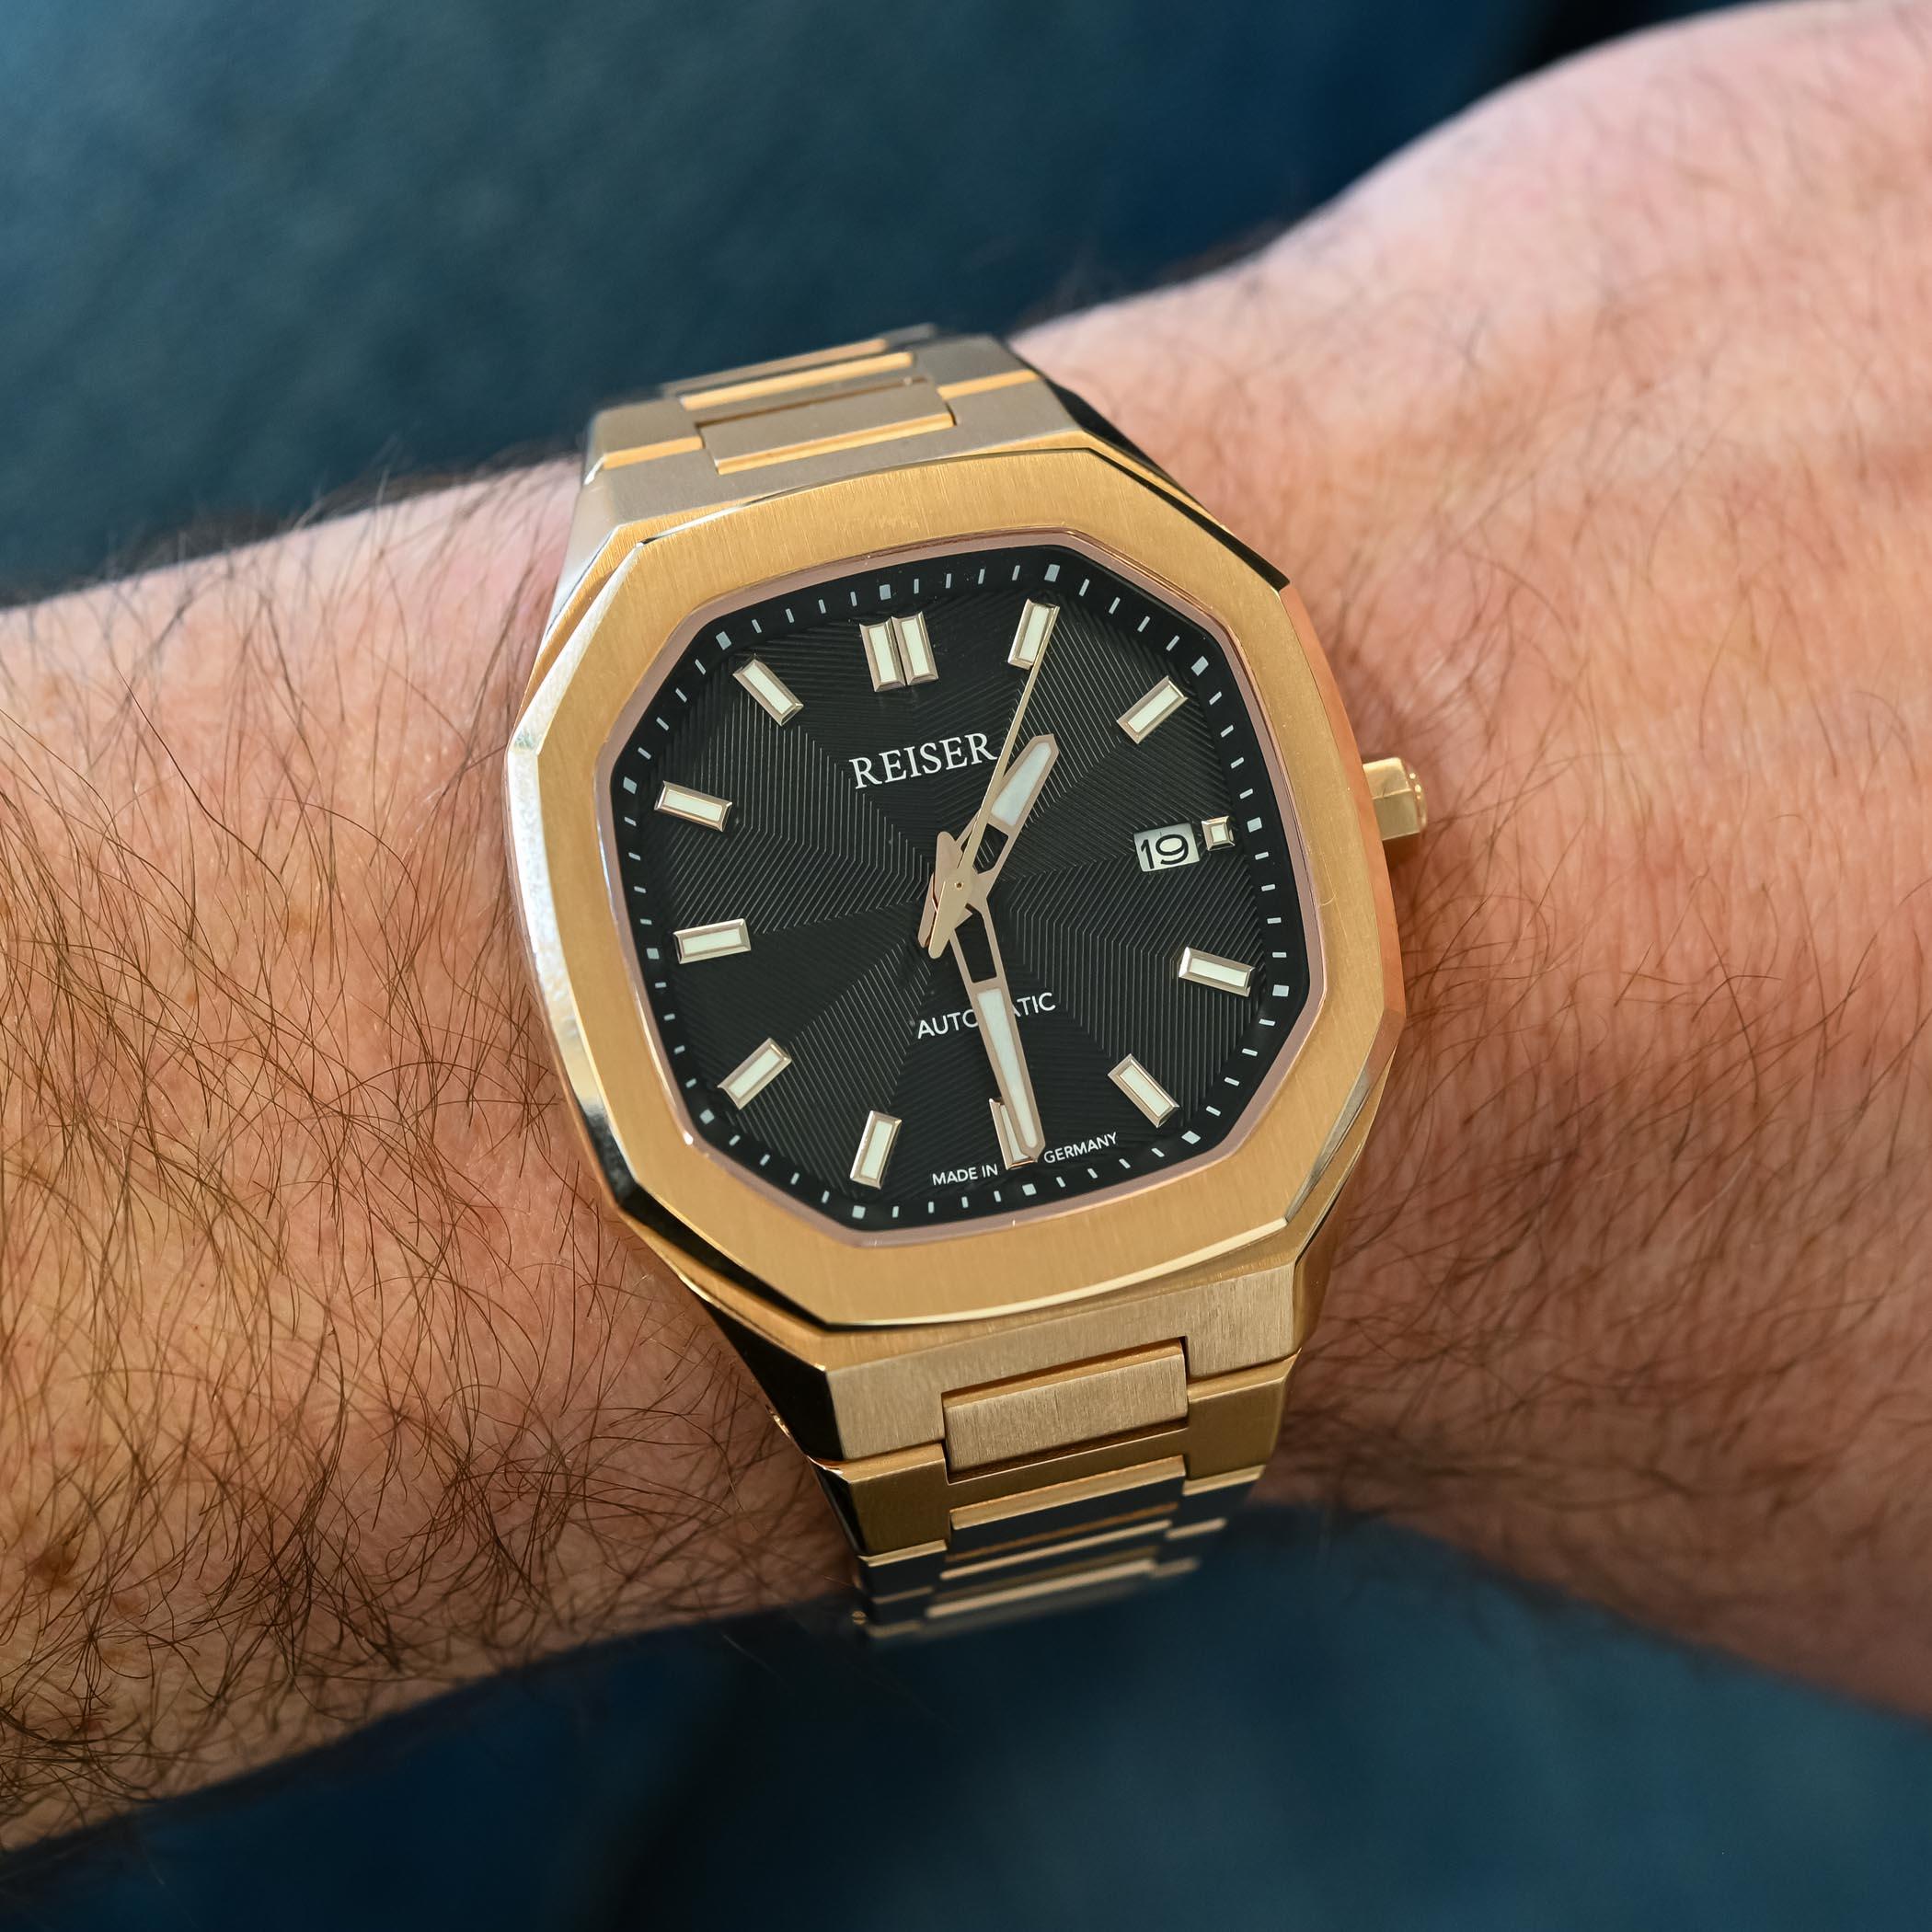 Reiser Alpen Date Watch - value proposition hands-on - 4